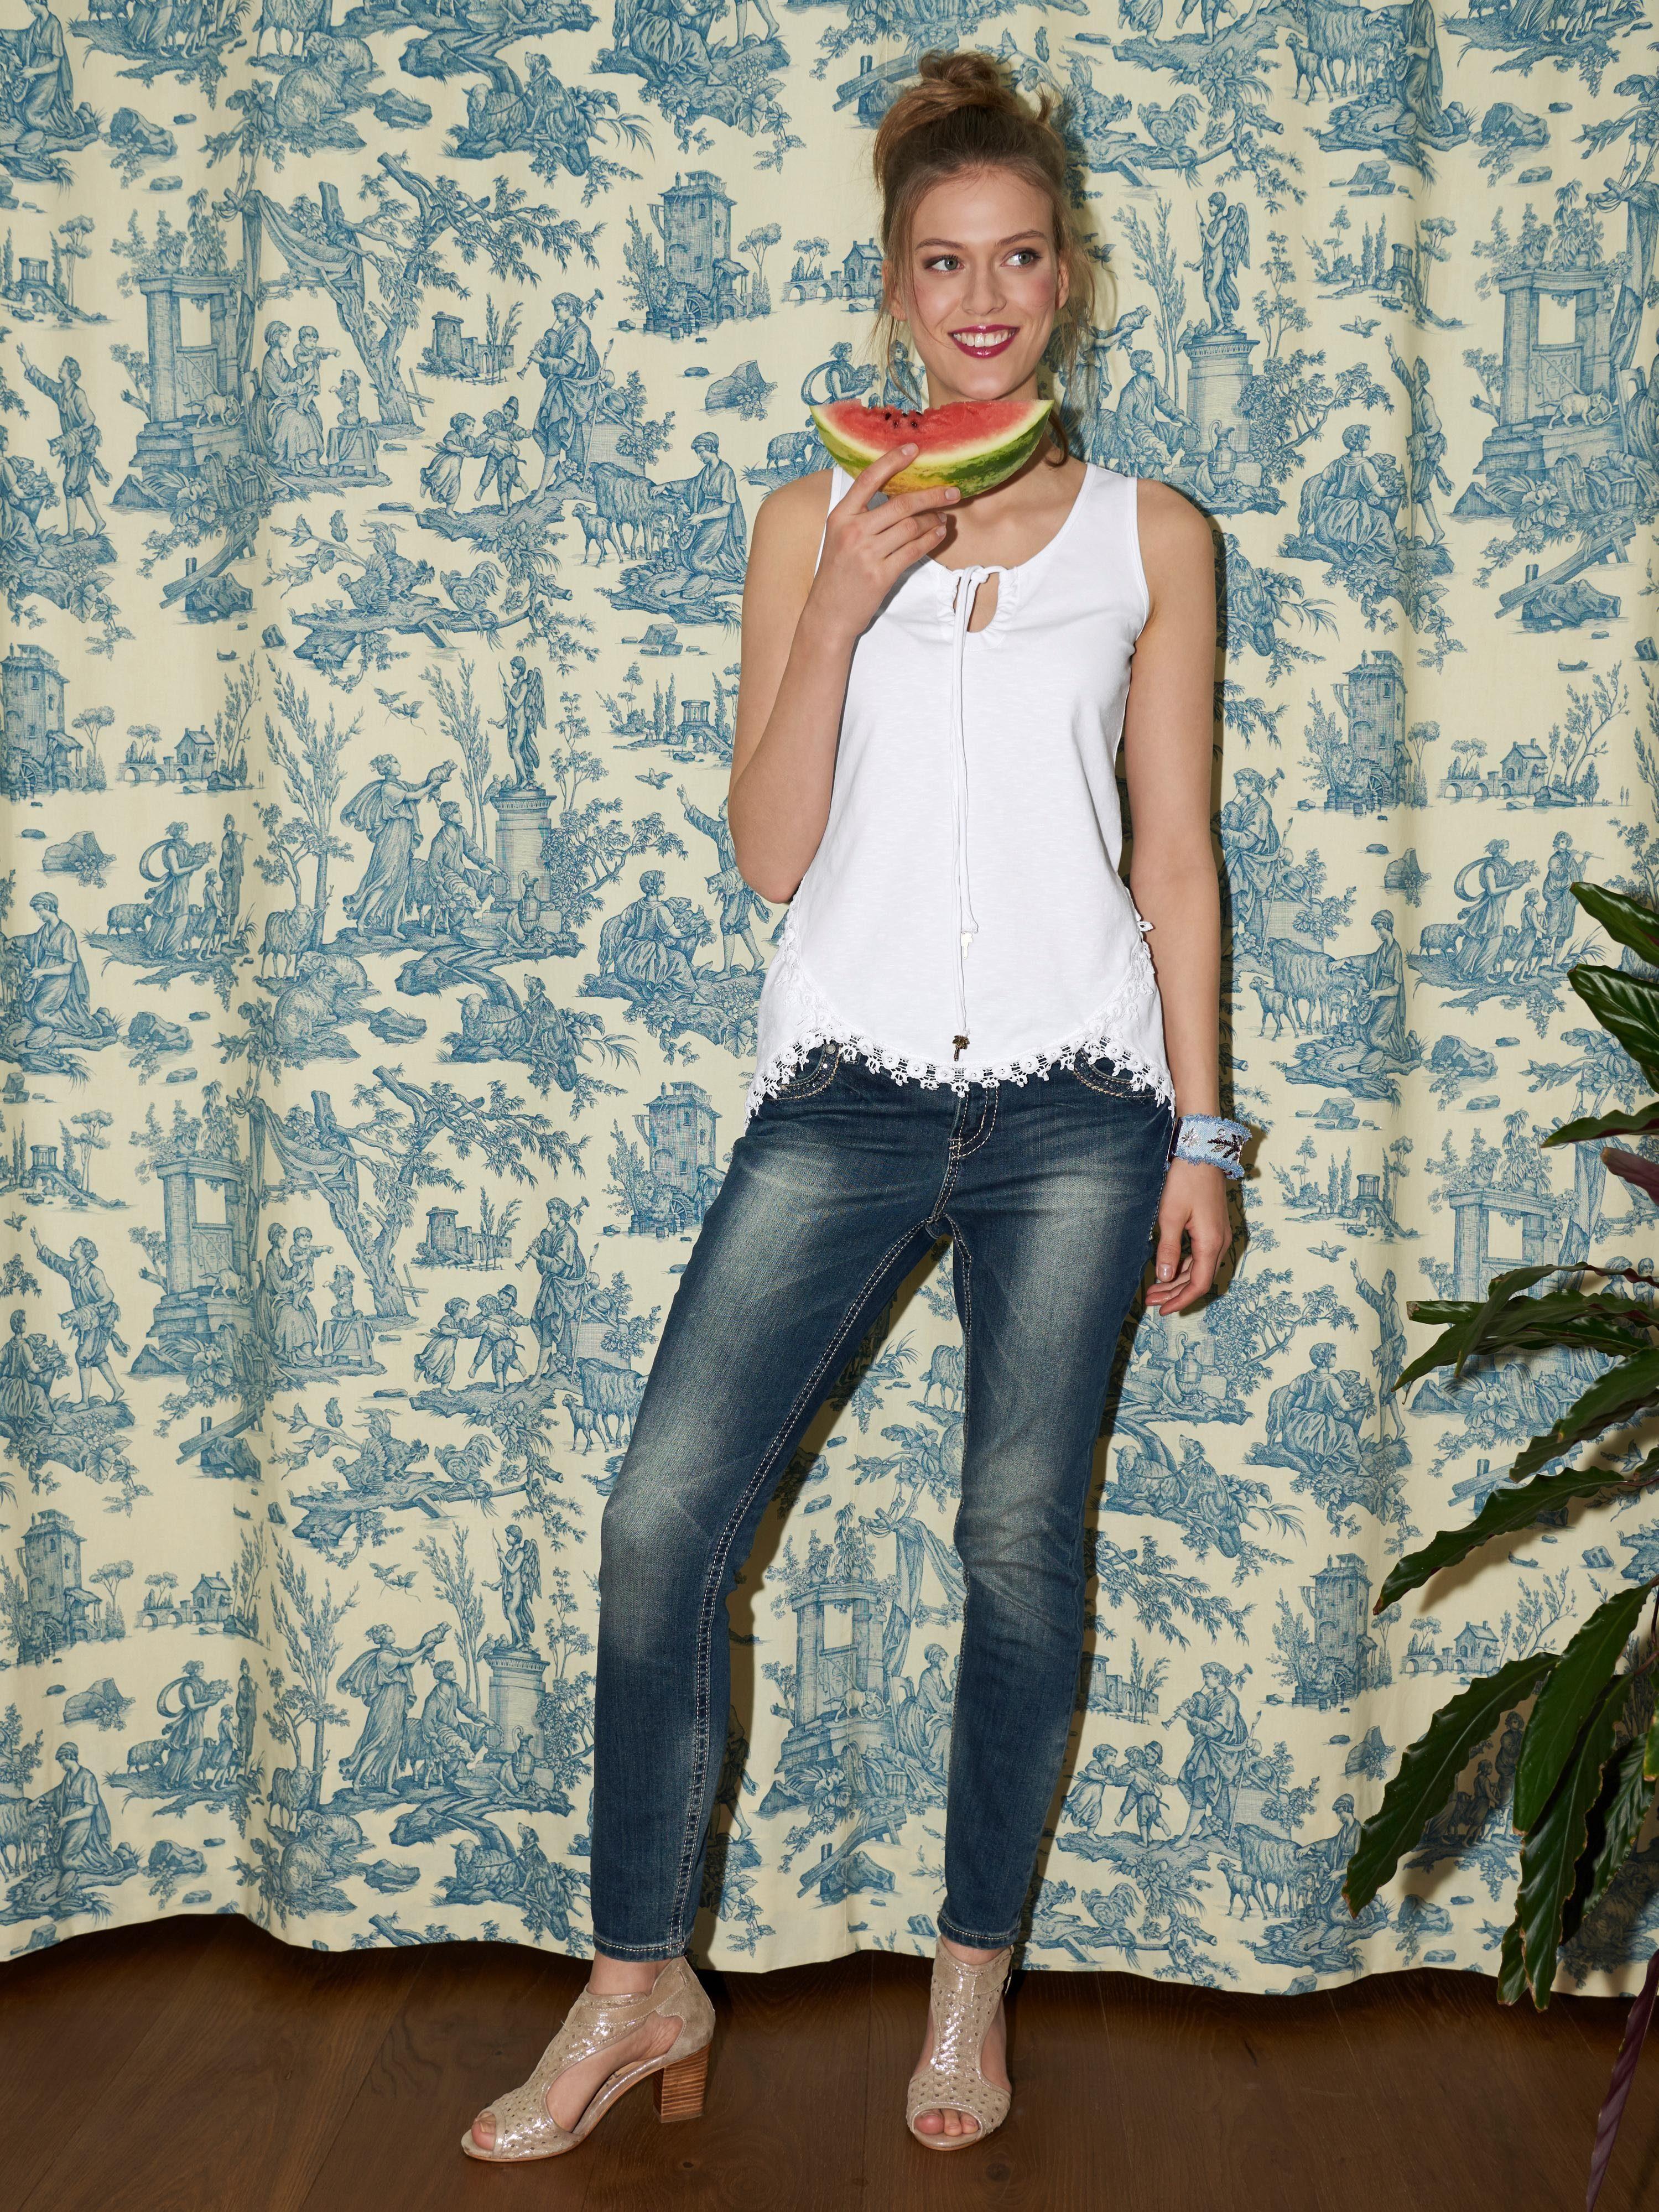 XYXYX Sandalette online kaufen  goldfarben